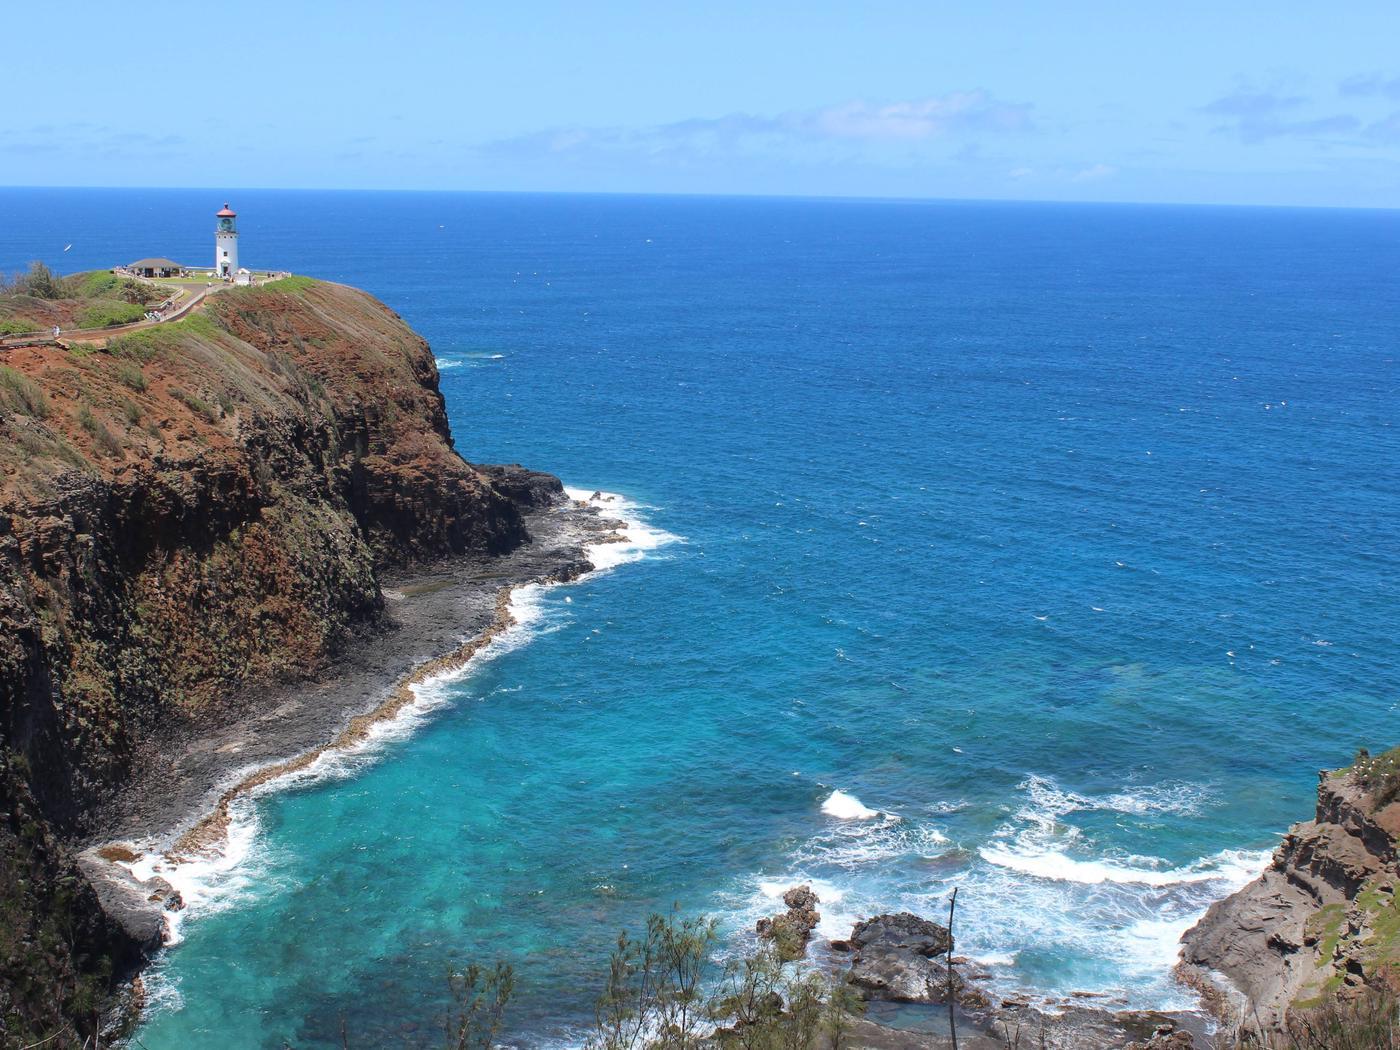 Kilauea Point National Wildlife Refuge, Hawaii